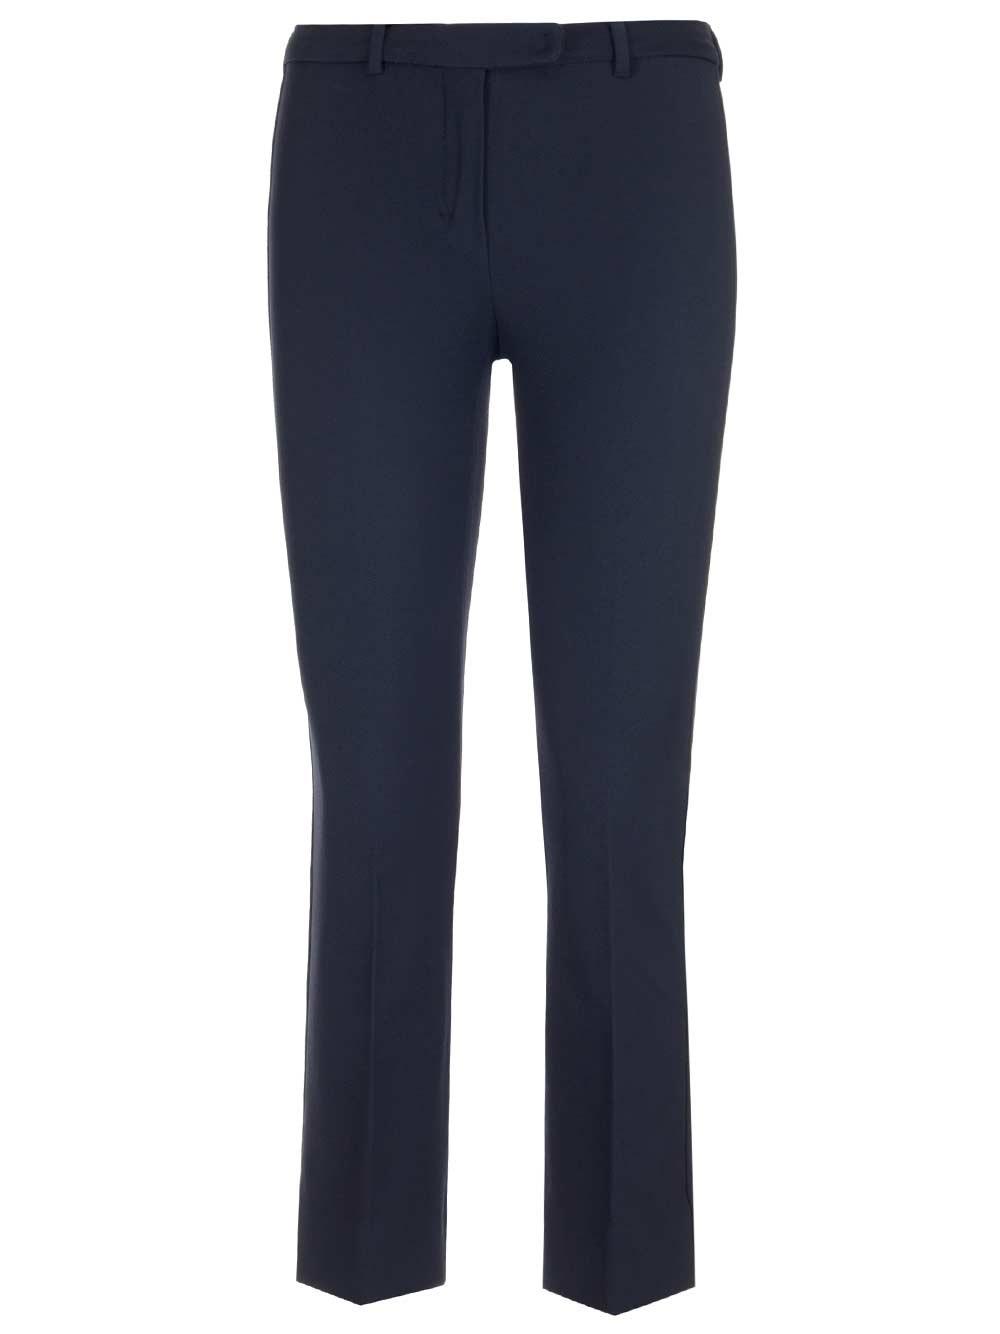 'S MAX MARA Classic Blue Trousers